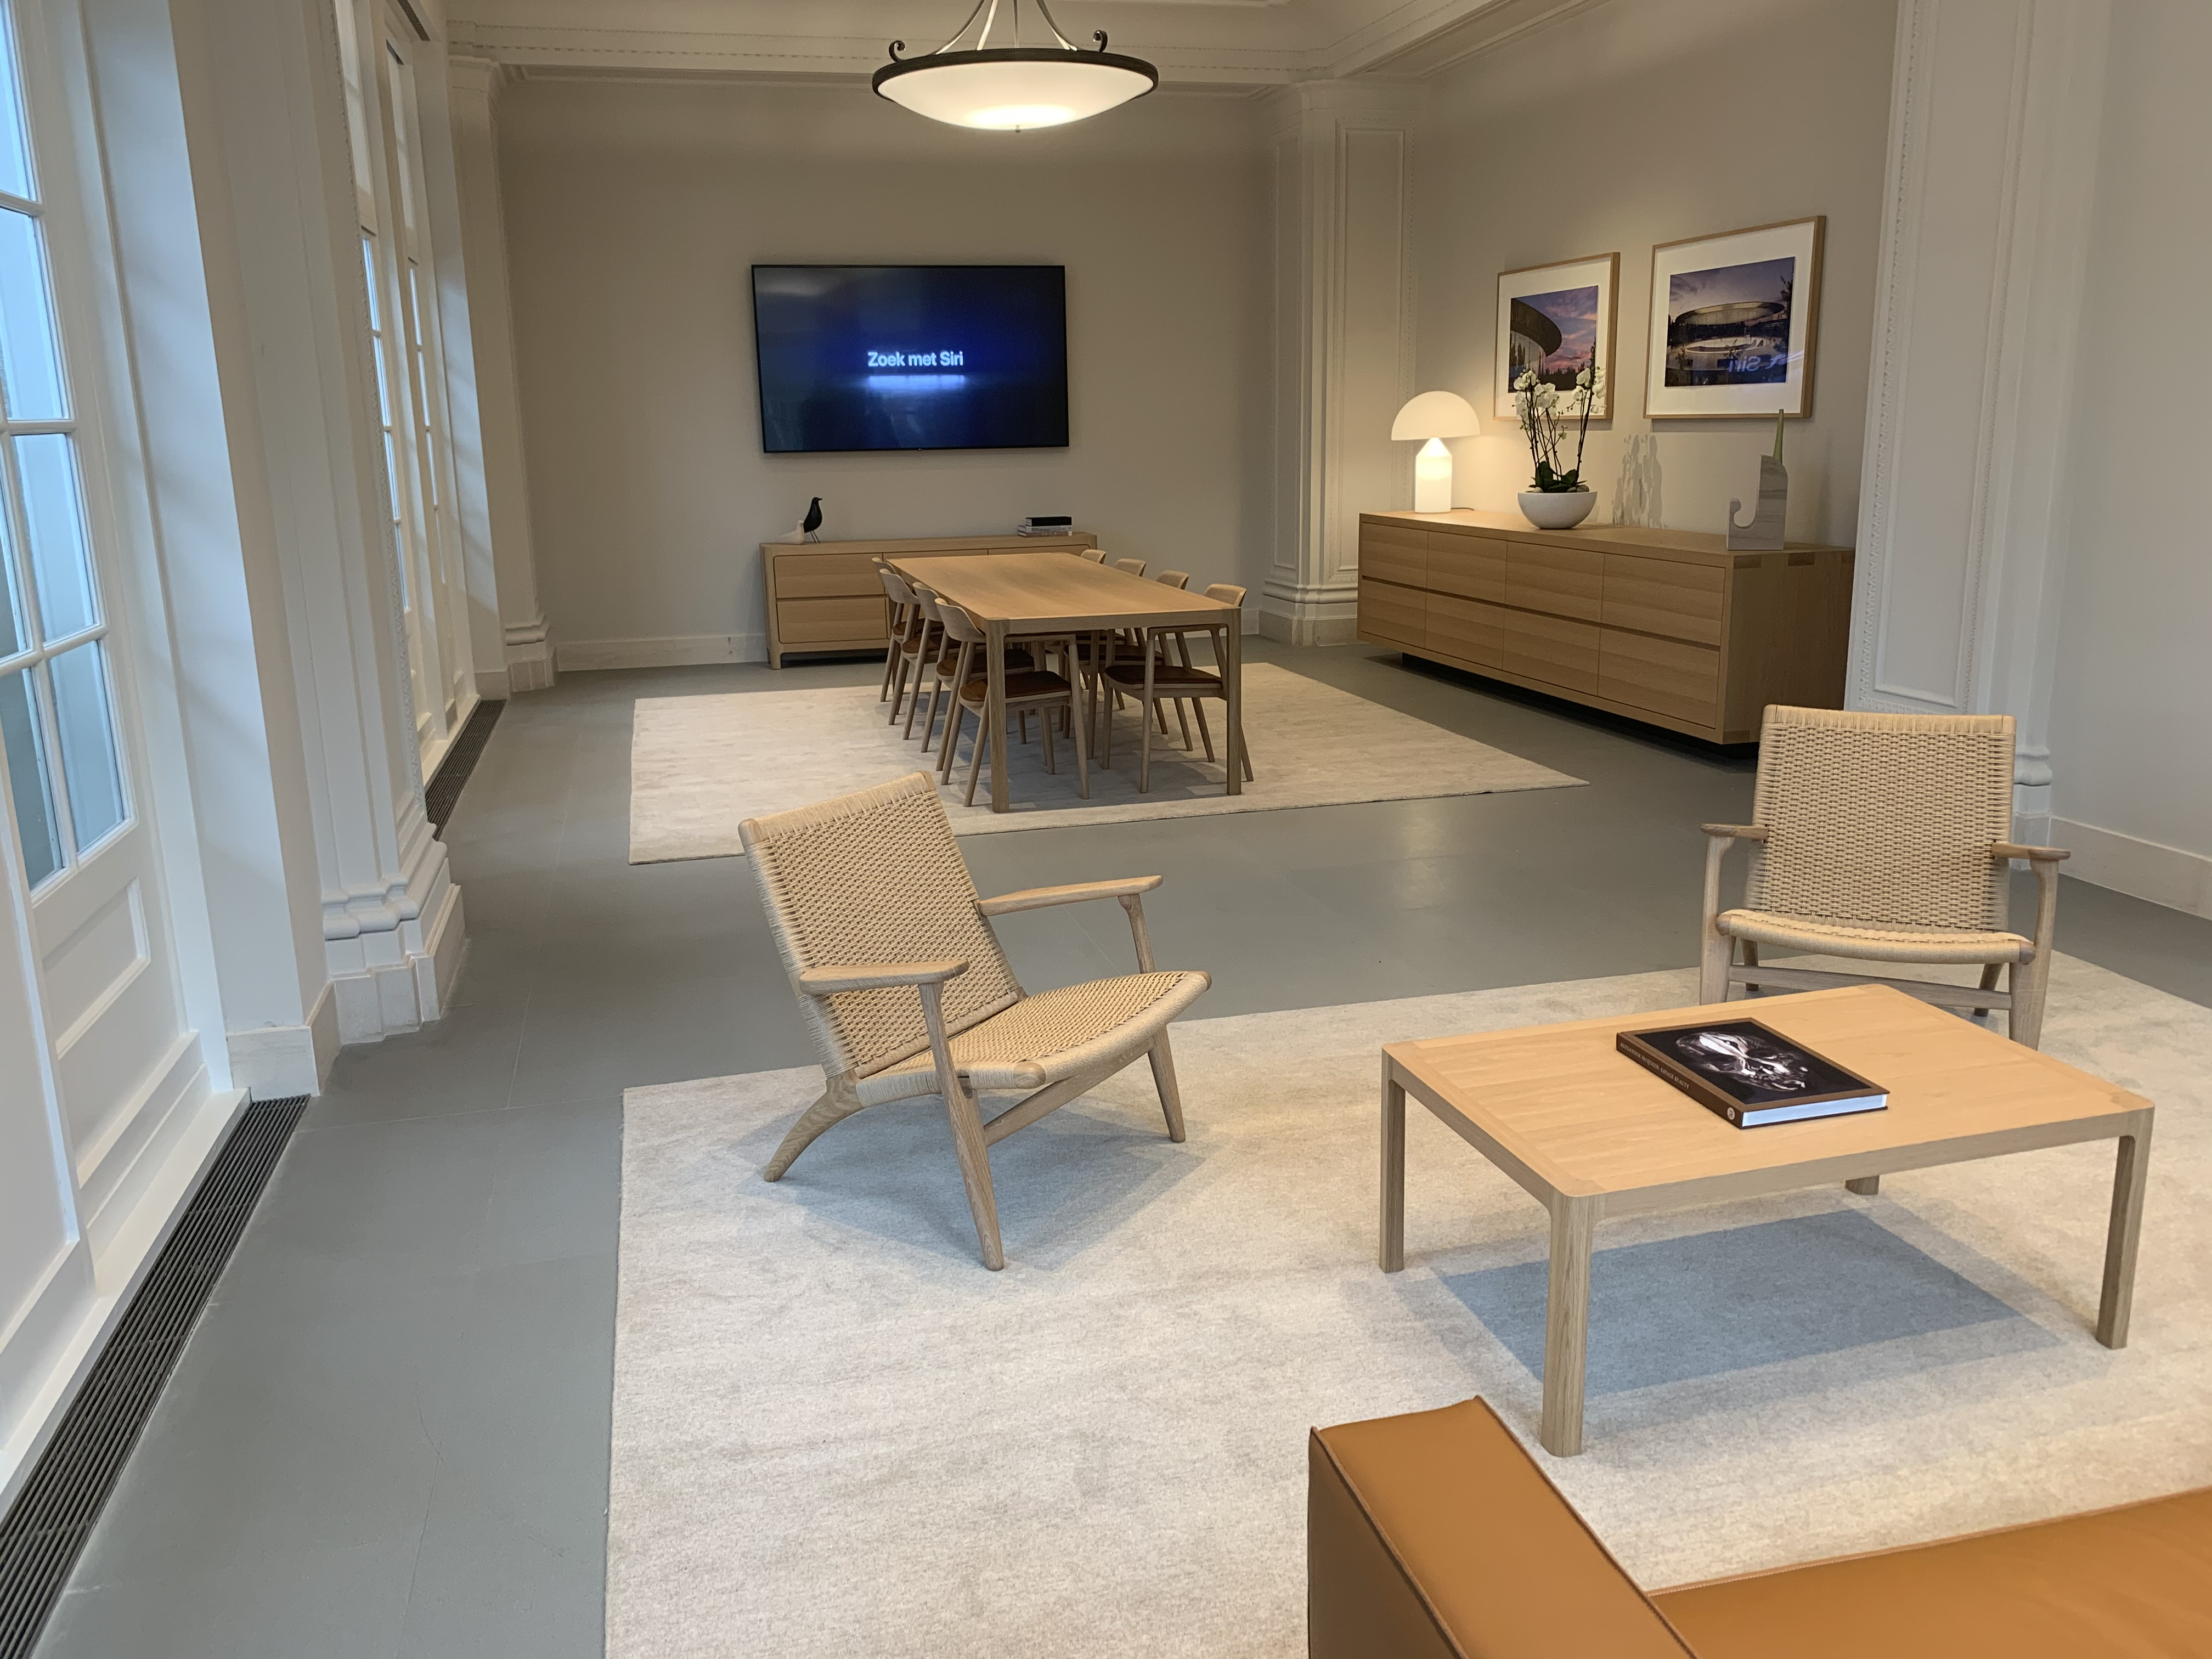 Apple Amsterdam heropening 2019 - 014